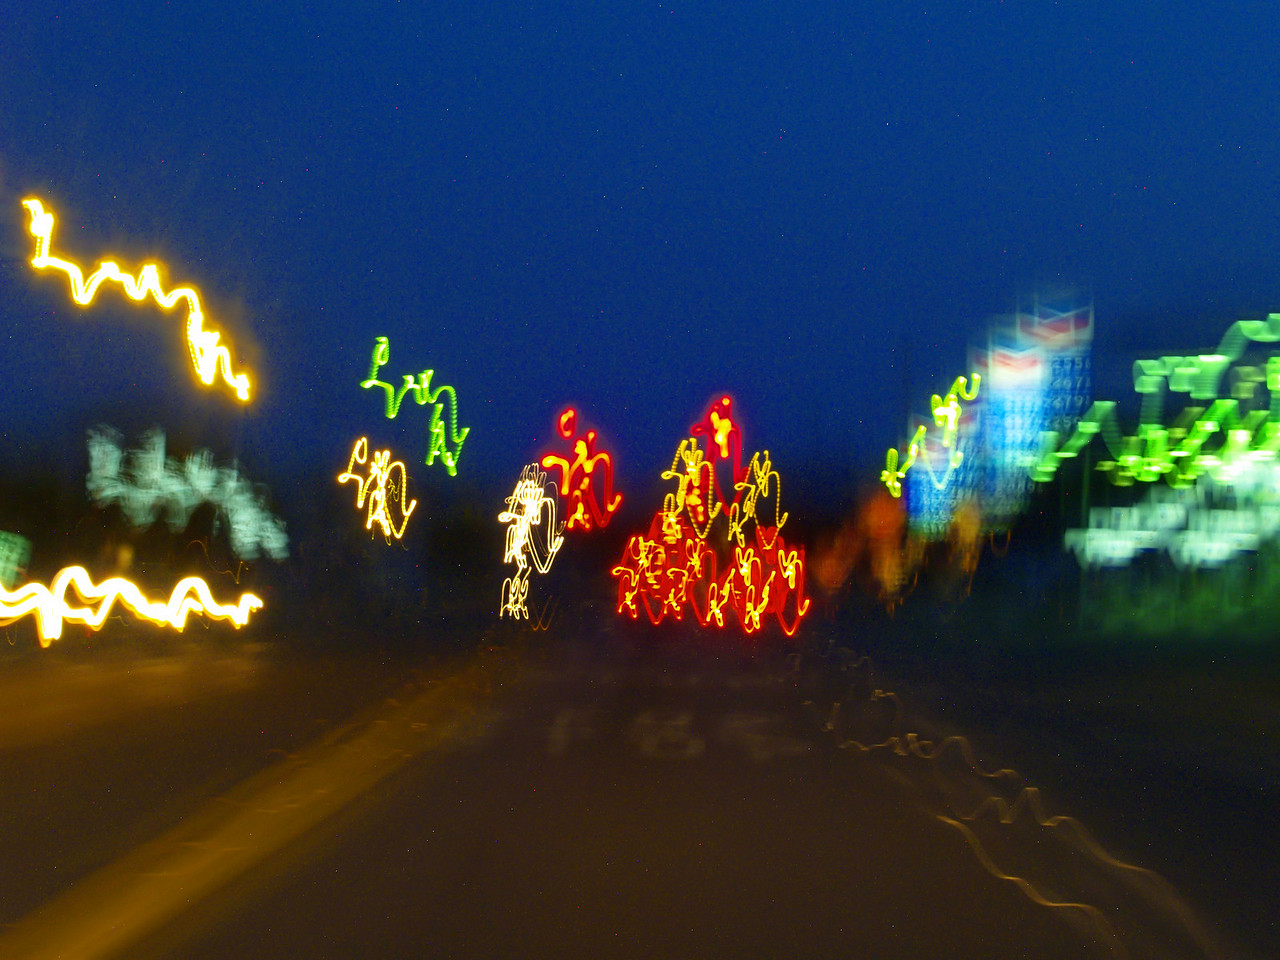 OLYMPUS DIGITAL CAMERA--Roadside lights in Karnes City, Texas.